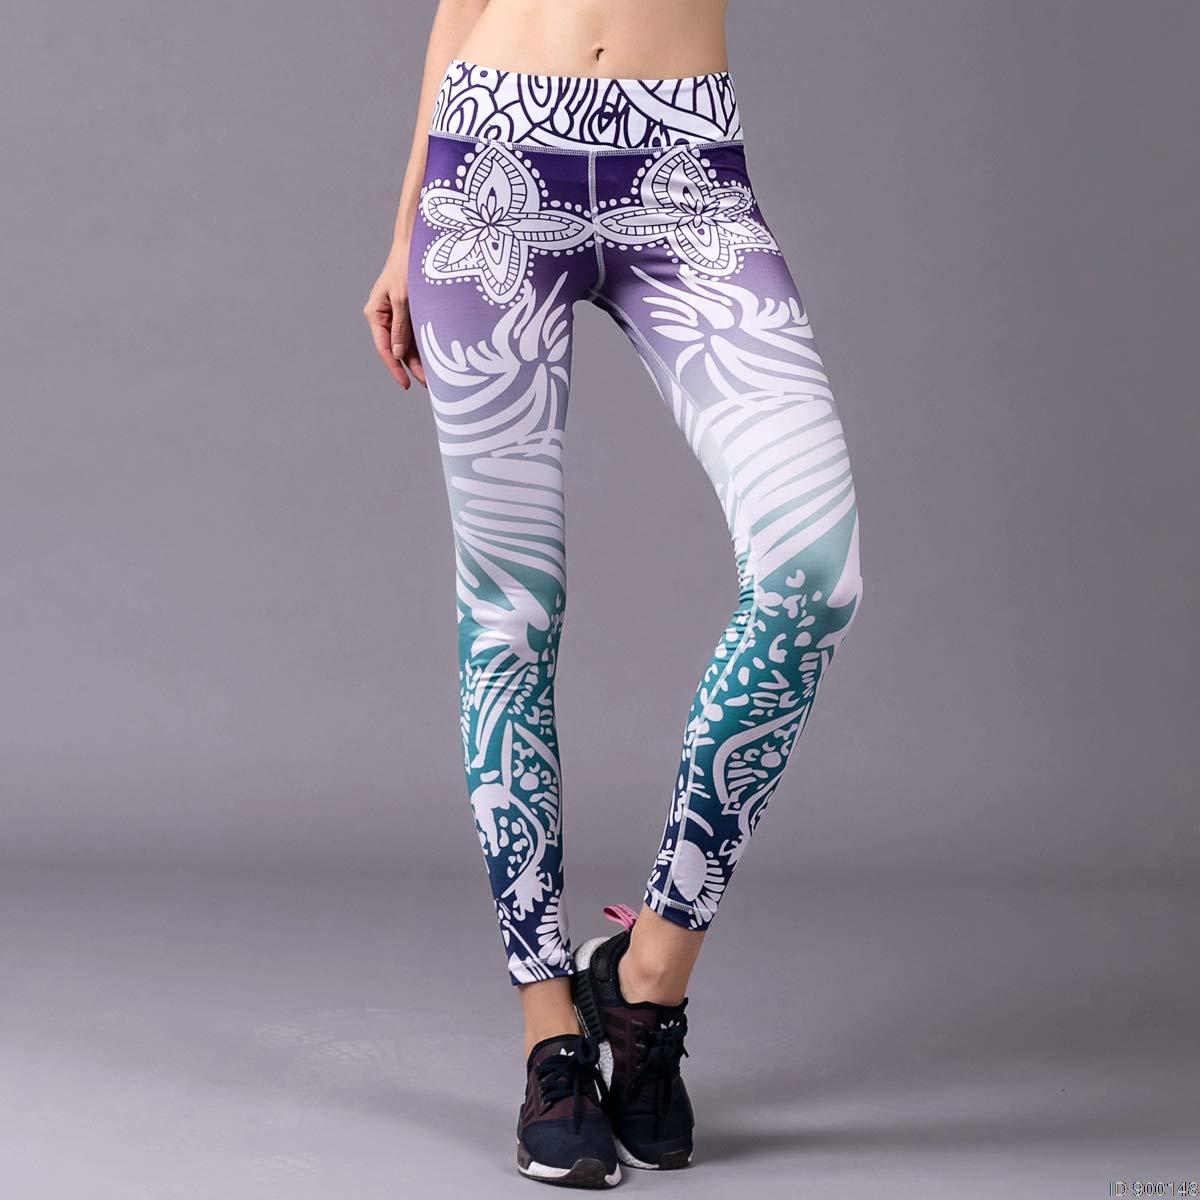 YUYOGAP Druck Yoga Hosen Frauen Fitness Leggings Workout Sport Laufen Leggings Sexy Push Up Gym Wear Elastic Slim Pants